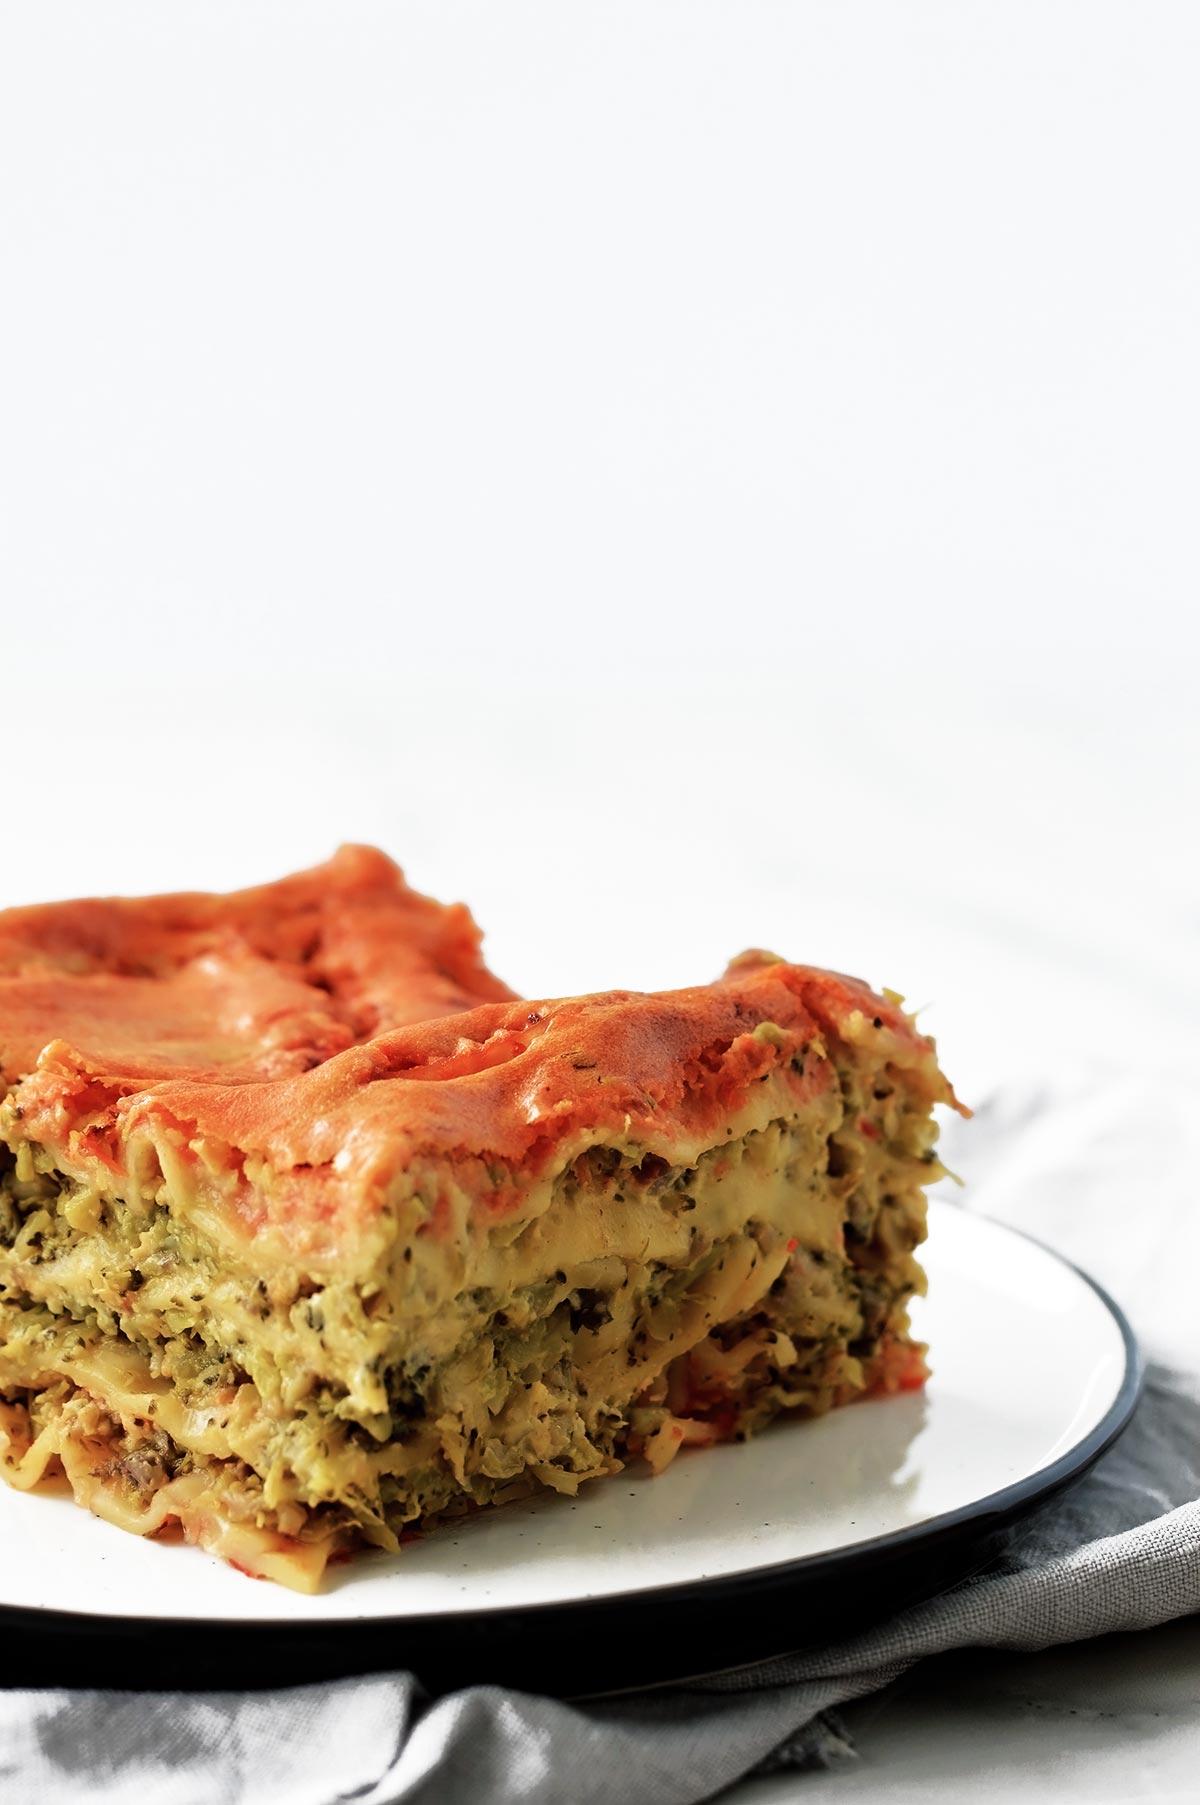 vegan lasagna served on a white plate